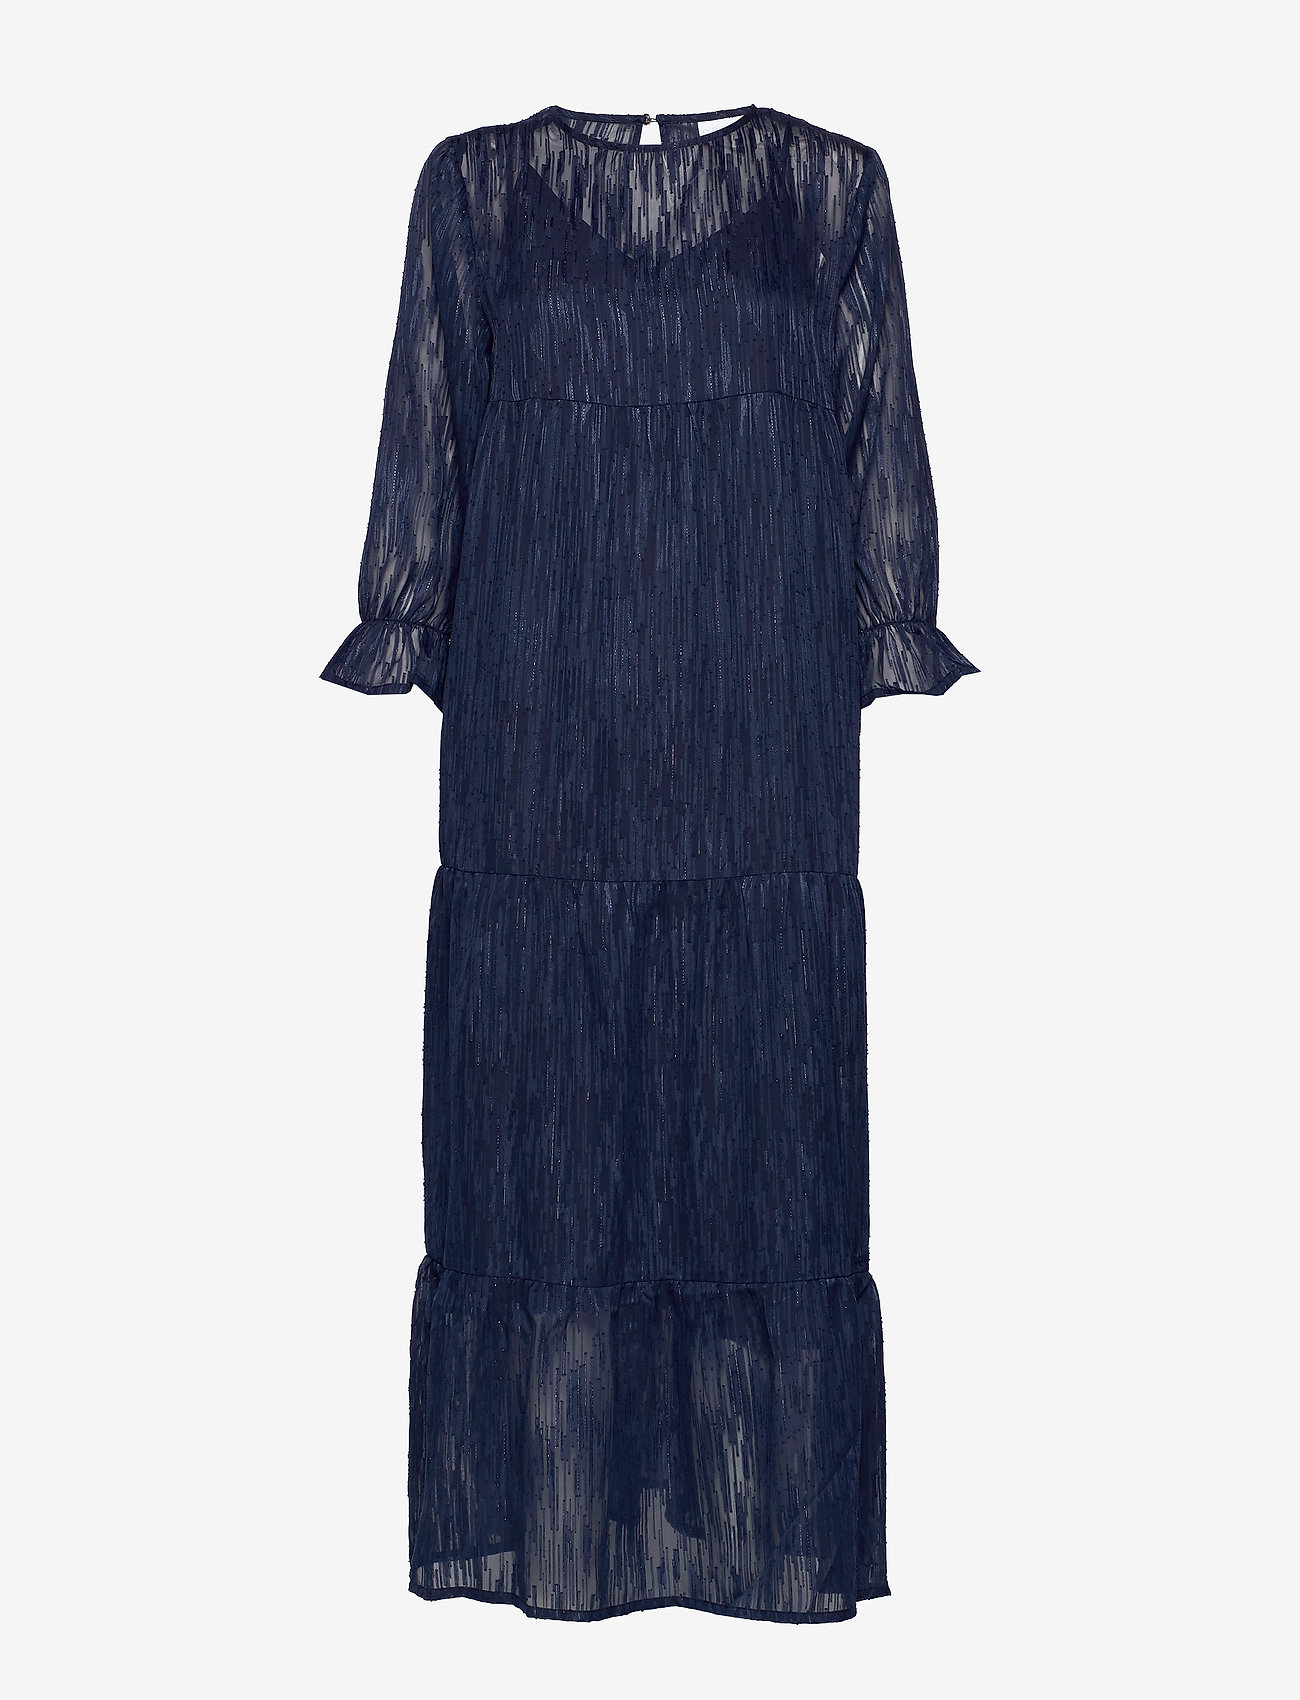 Coster Copenhagen - Dress long sleeved w. volume at sle - robes de fête - night sky blue